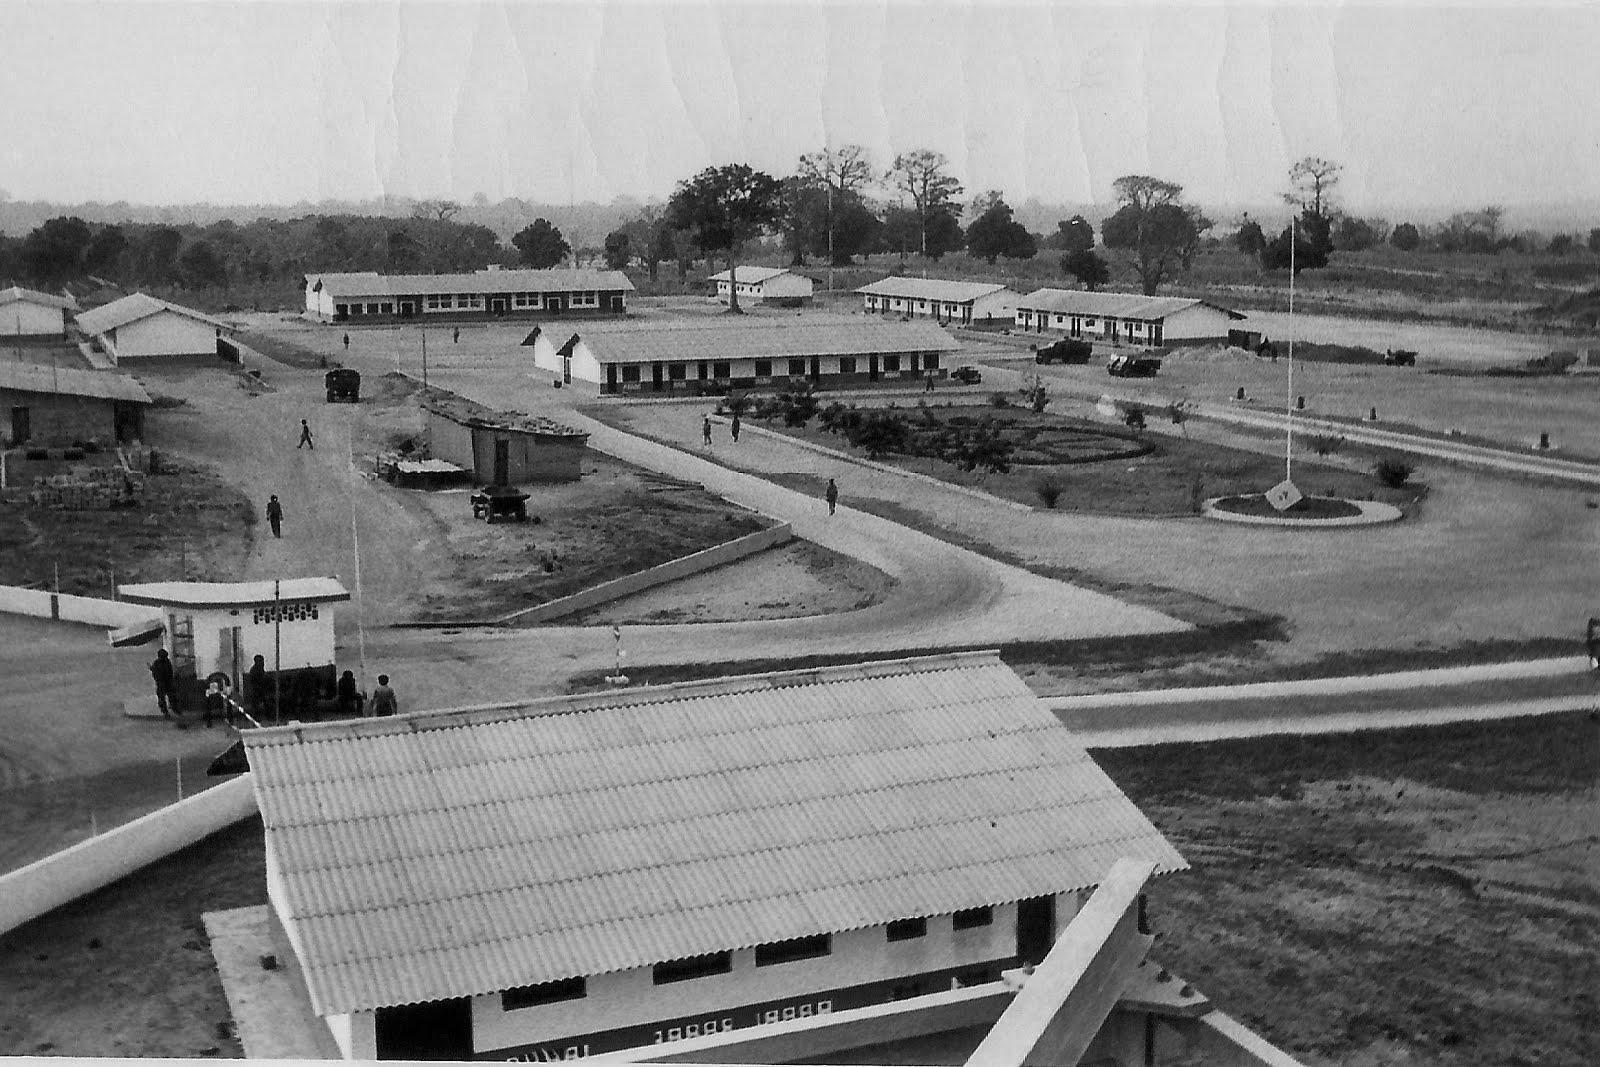 Agrupamento das TRMS, Stª Luzia - Bissau 1972